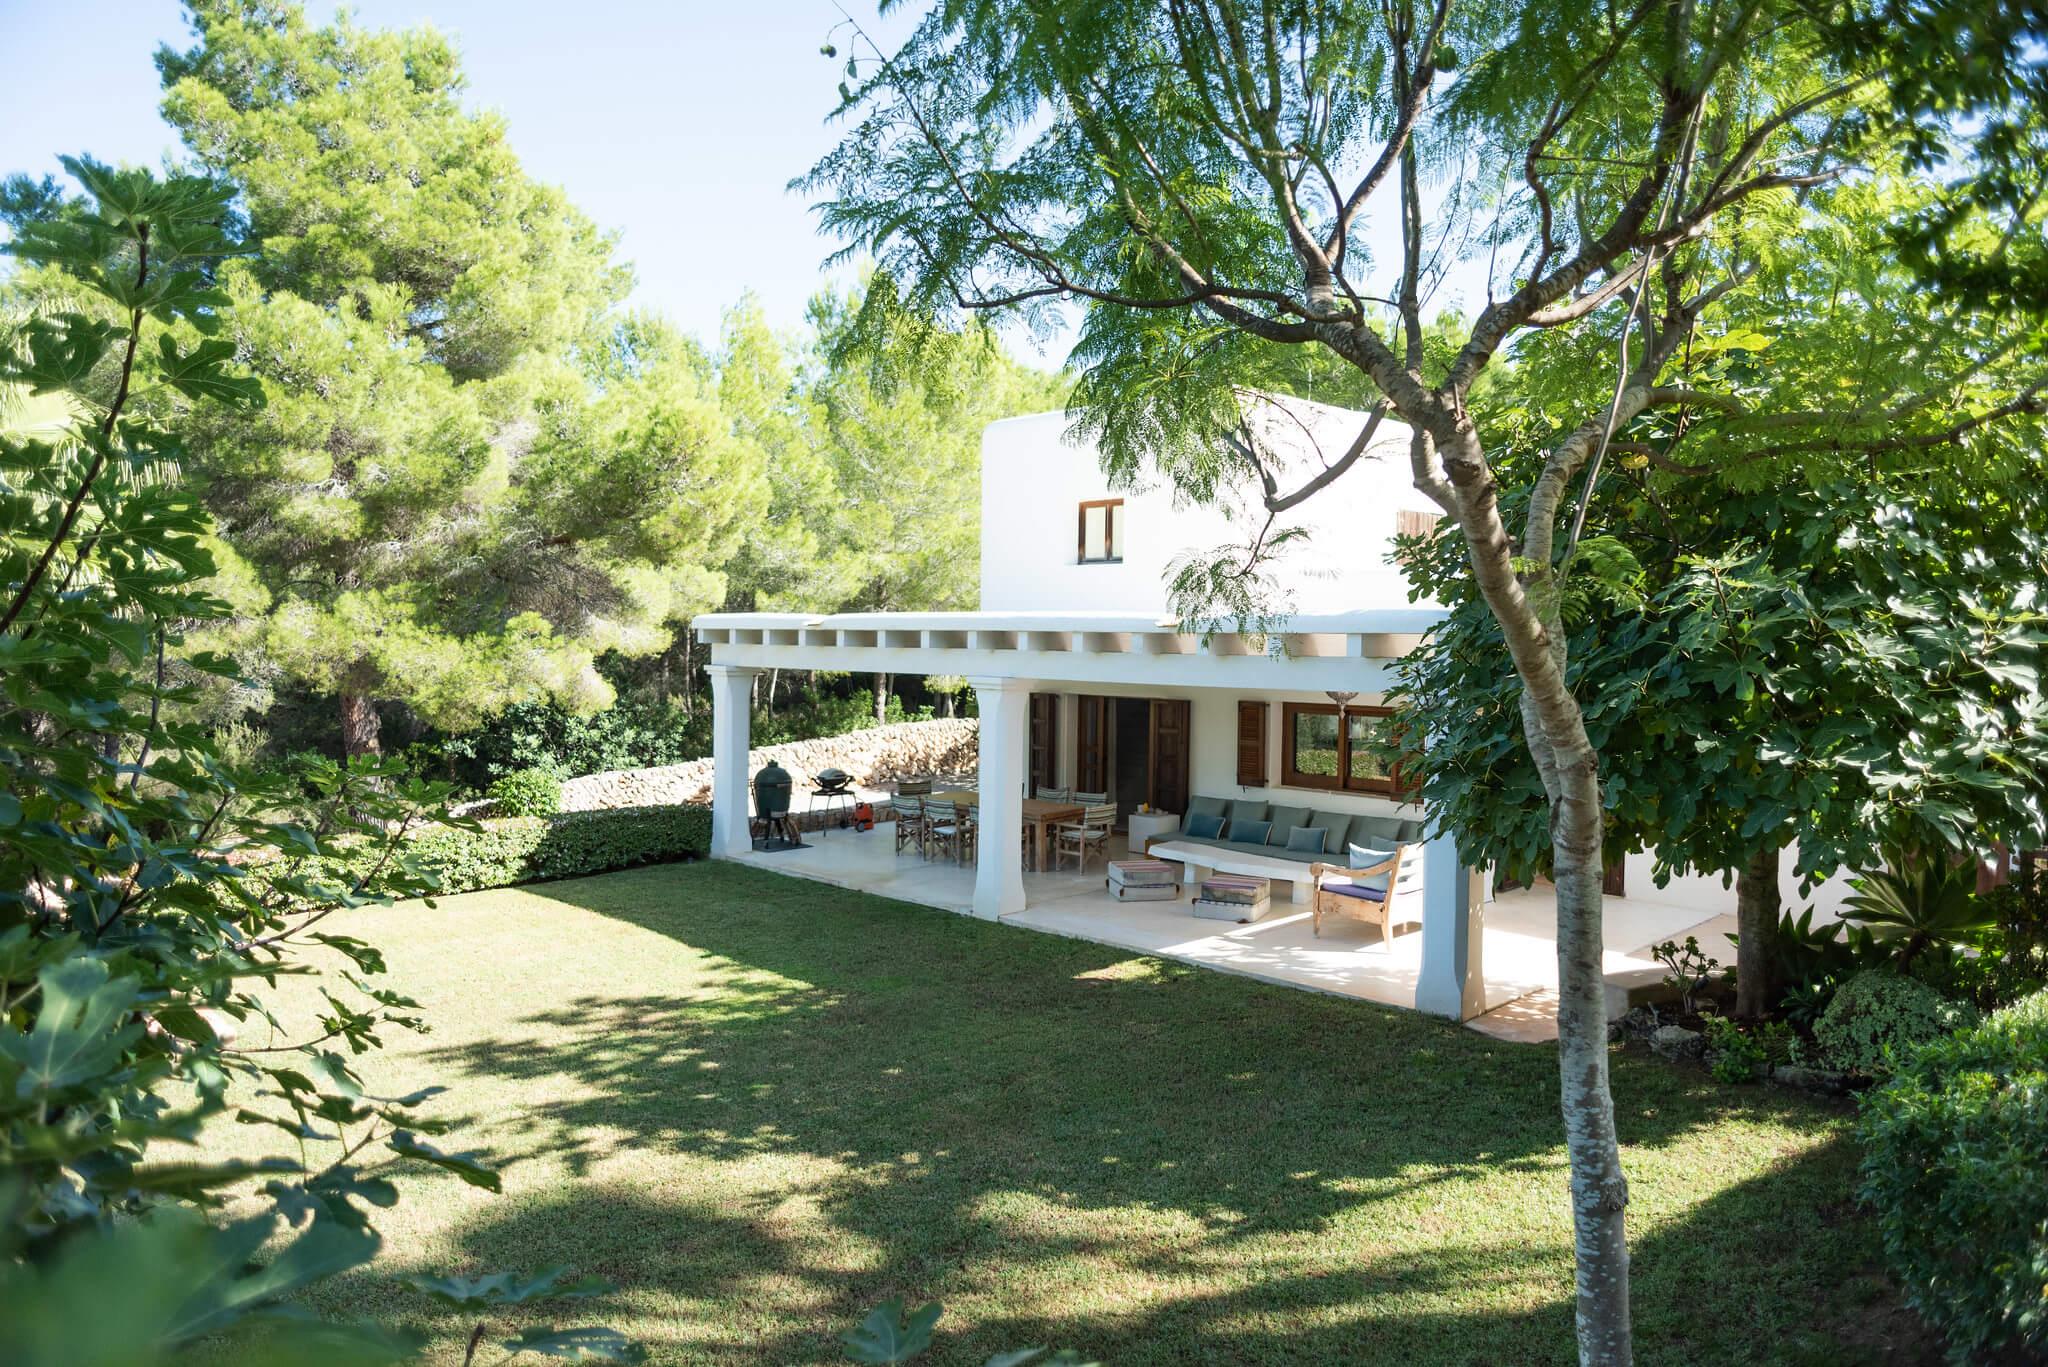 https://www.white-ibiza.com/wp-content/uploads/2020/06/white-ibiza-villas-casa-arabella-exterior-lawn.jpg